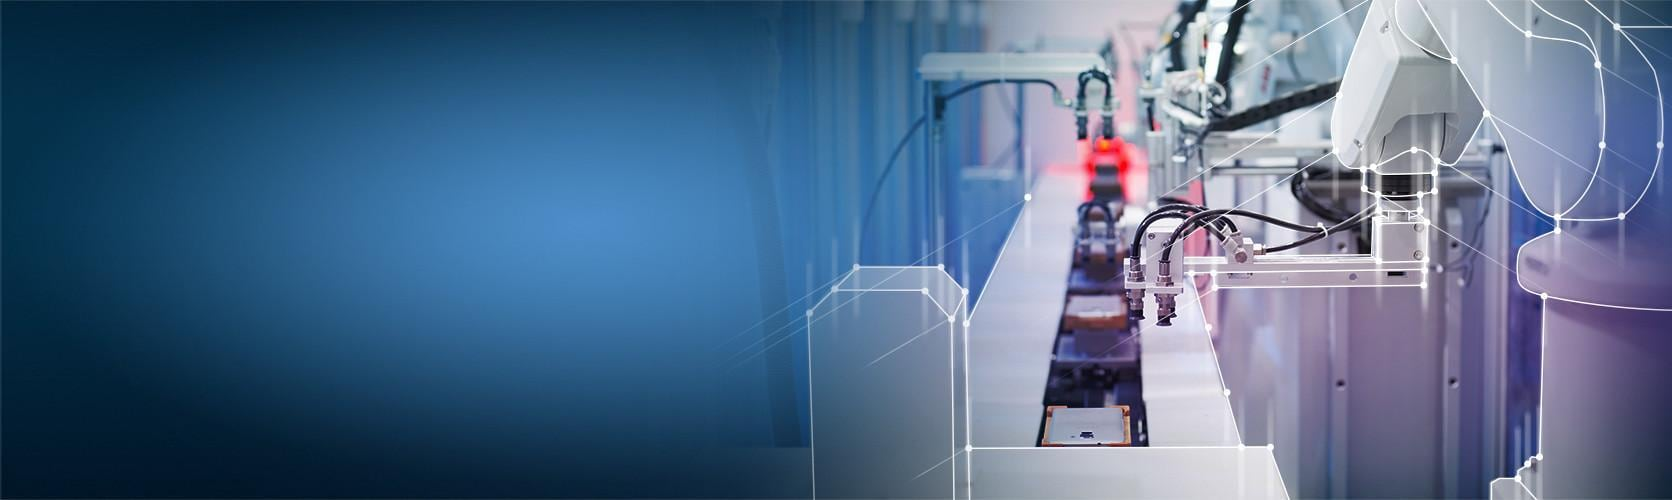 Robot arm at conveyor belt connected dots